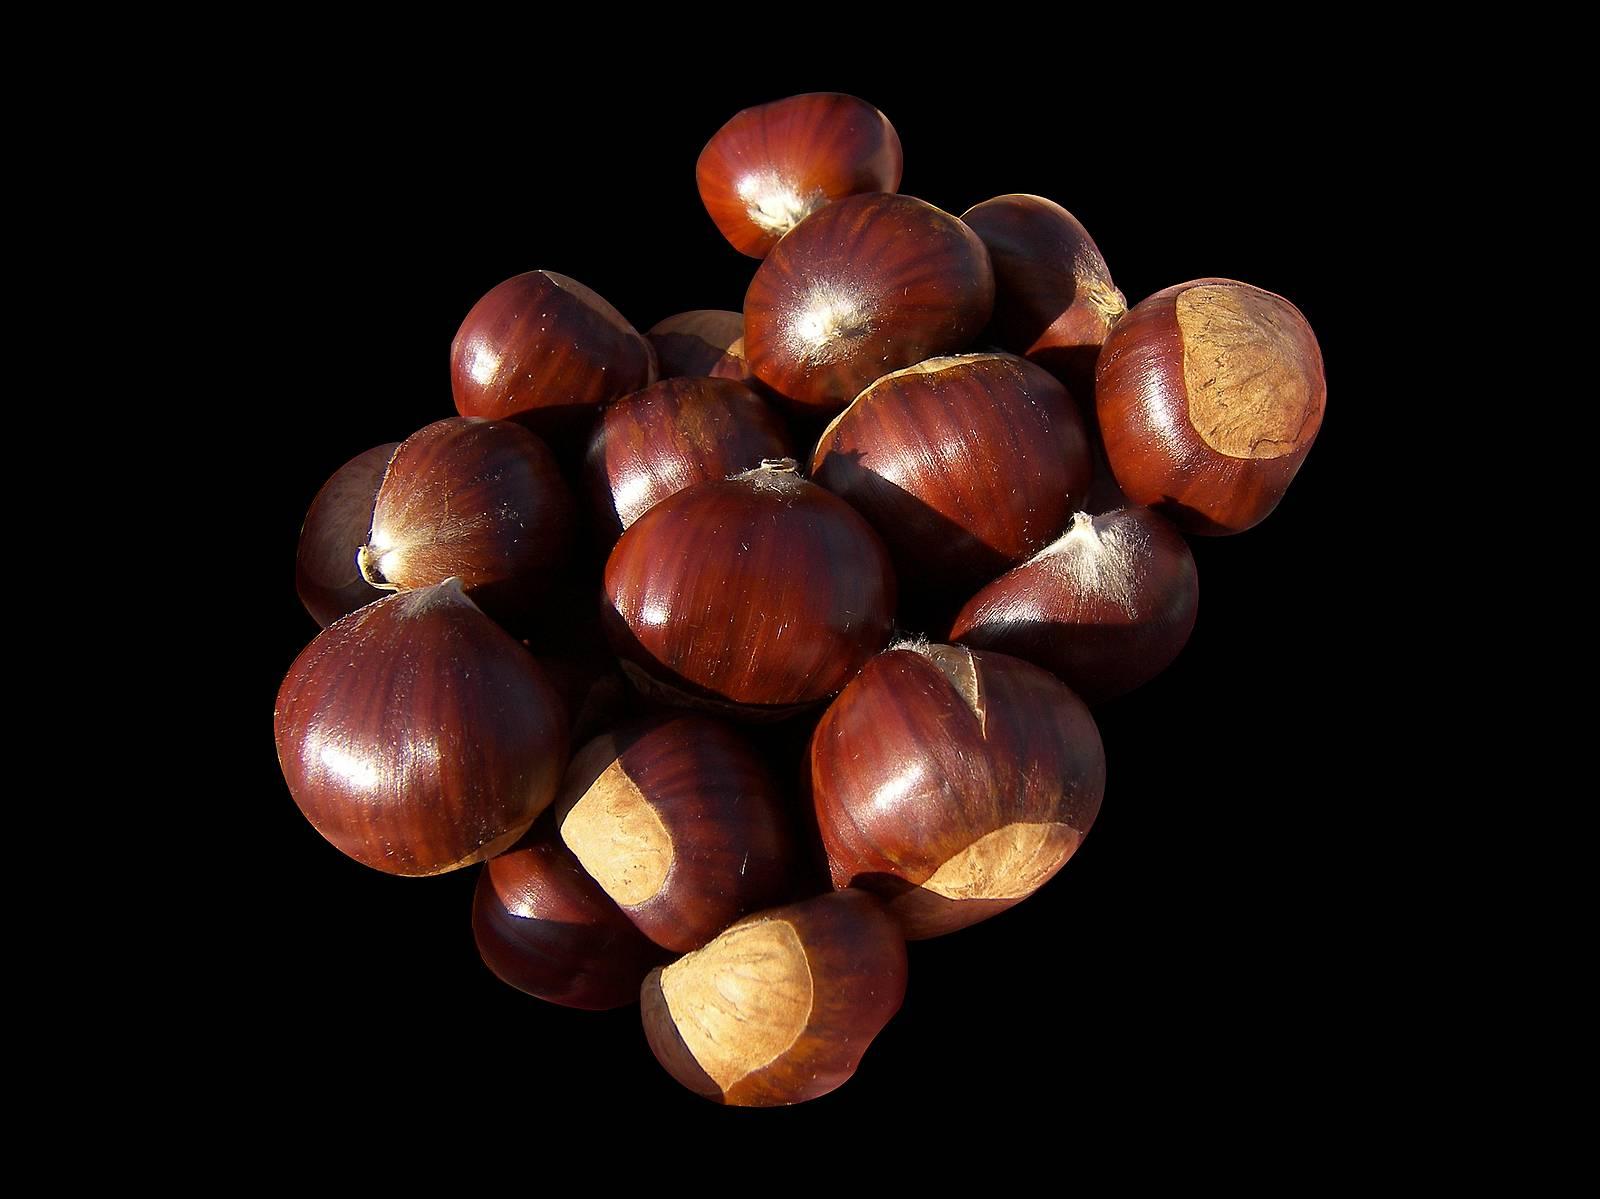 chestnut festival elos chania crete, chestnut festival inachori chania crete, chestnut event celebration chania, chania events, things to do chania, activities chania